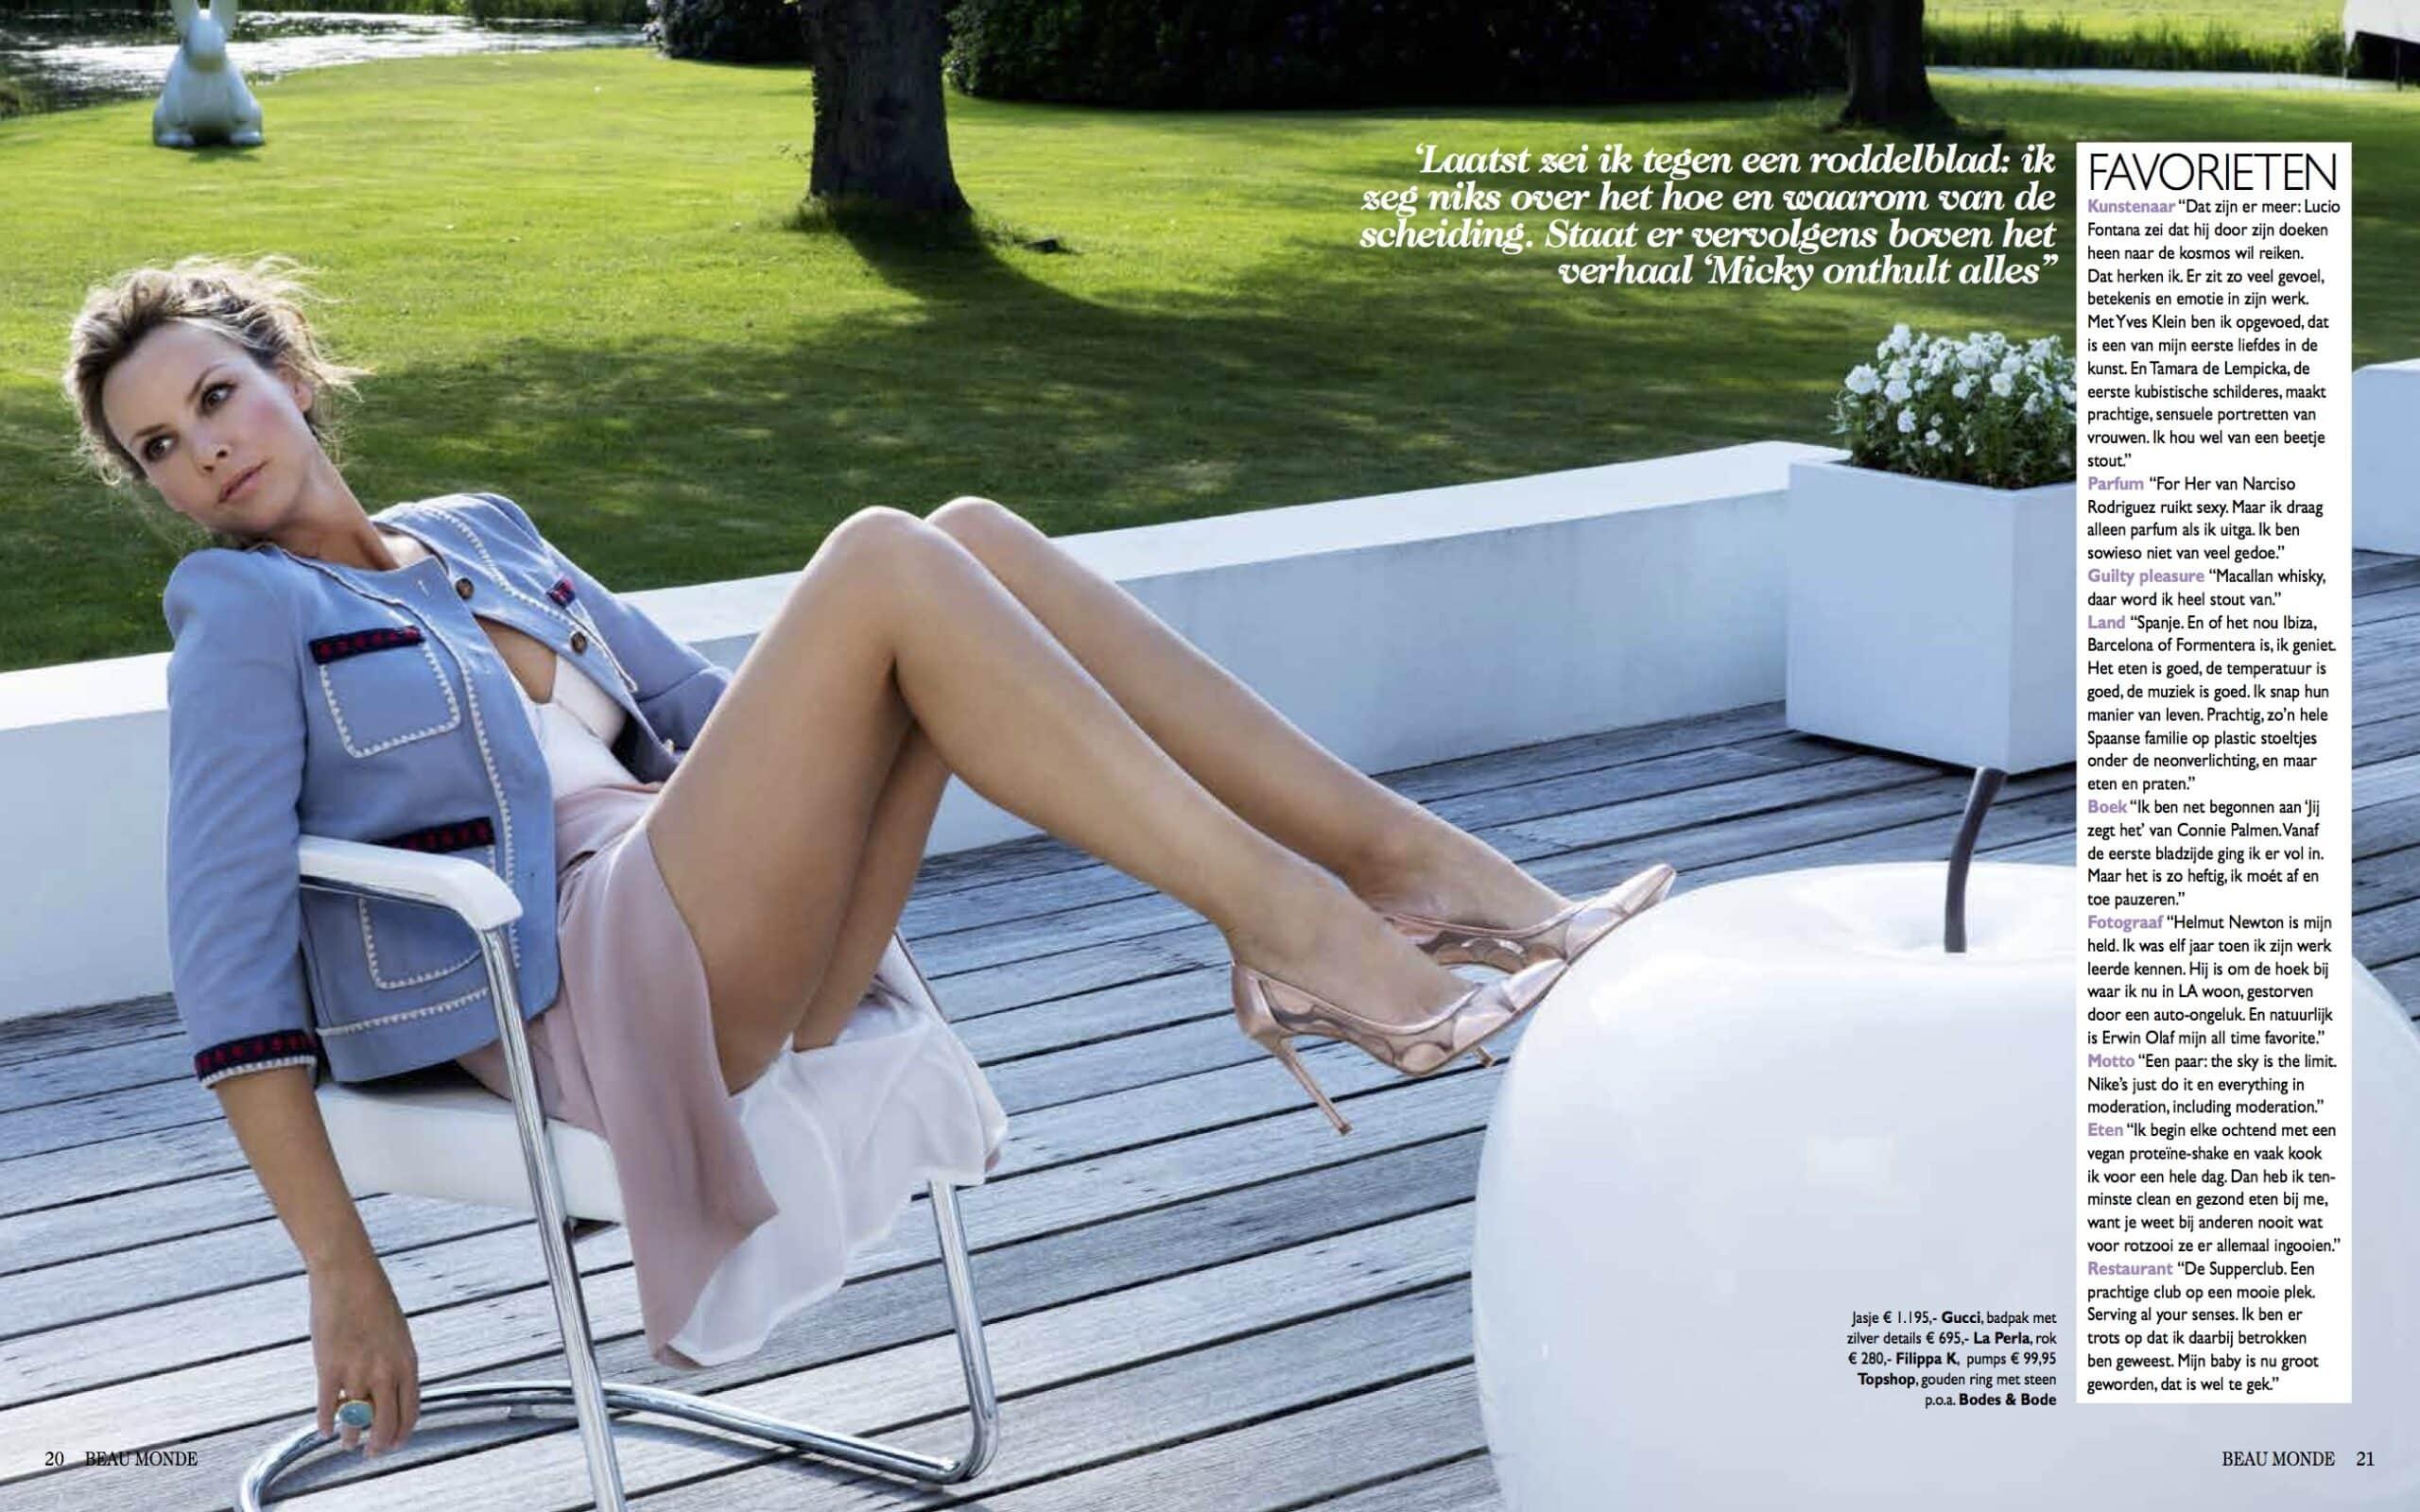 Groot Interview beau Monde 3